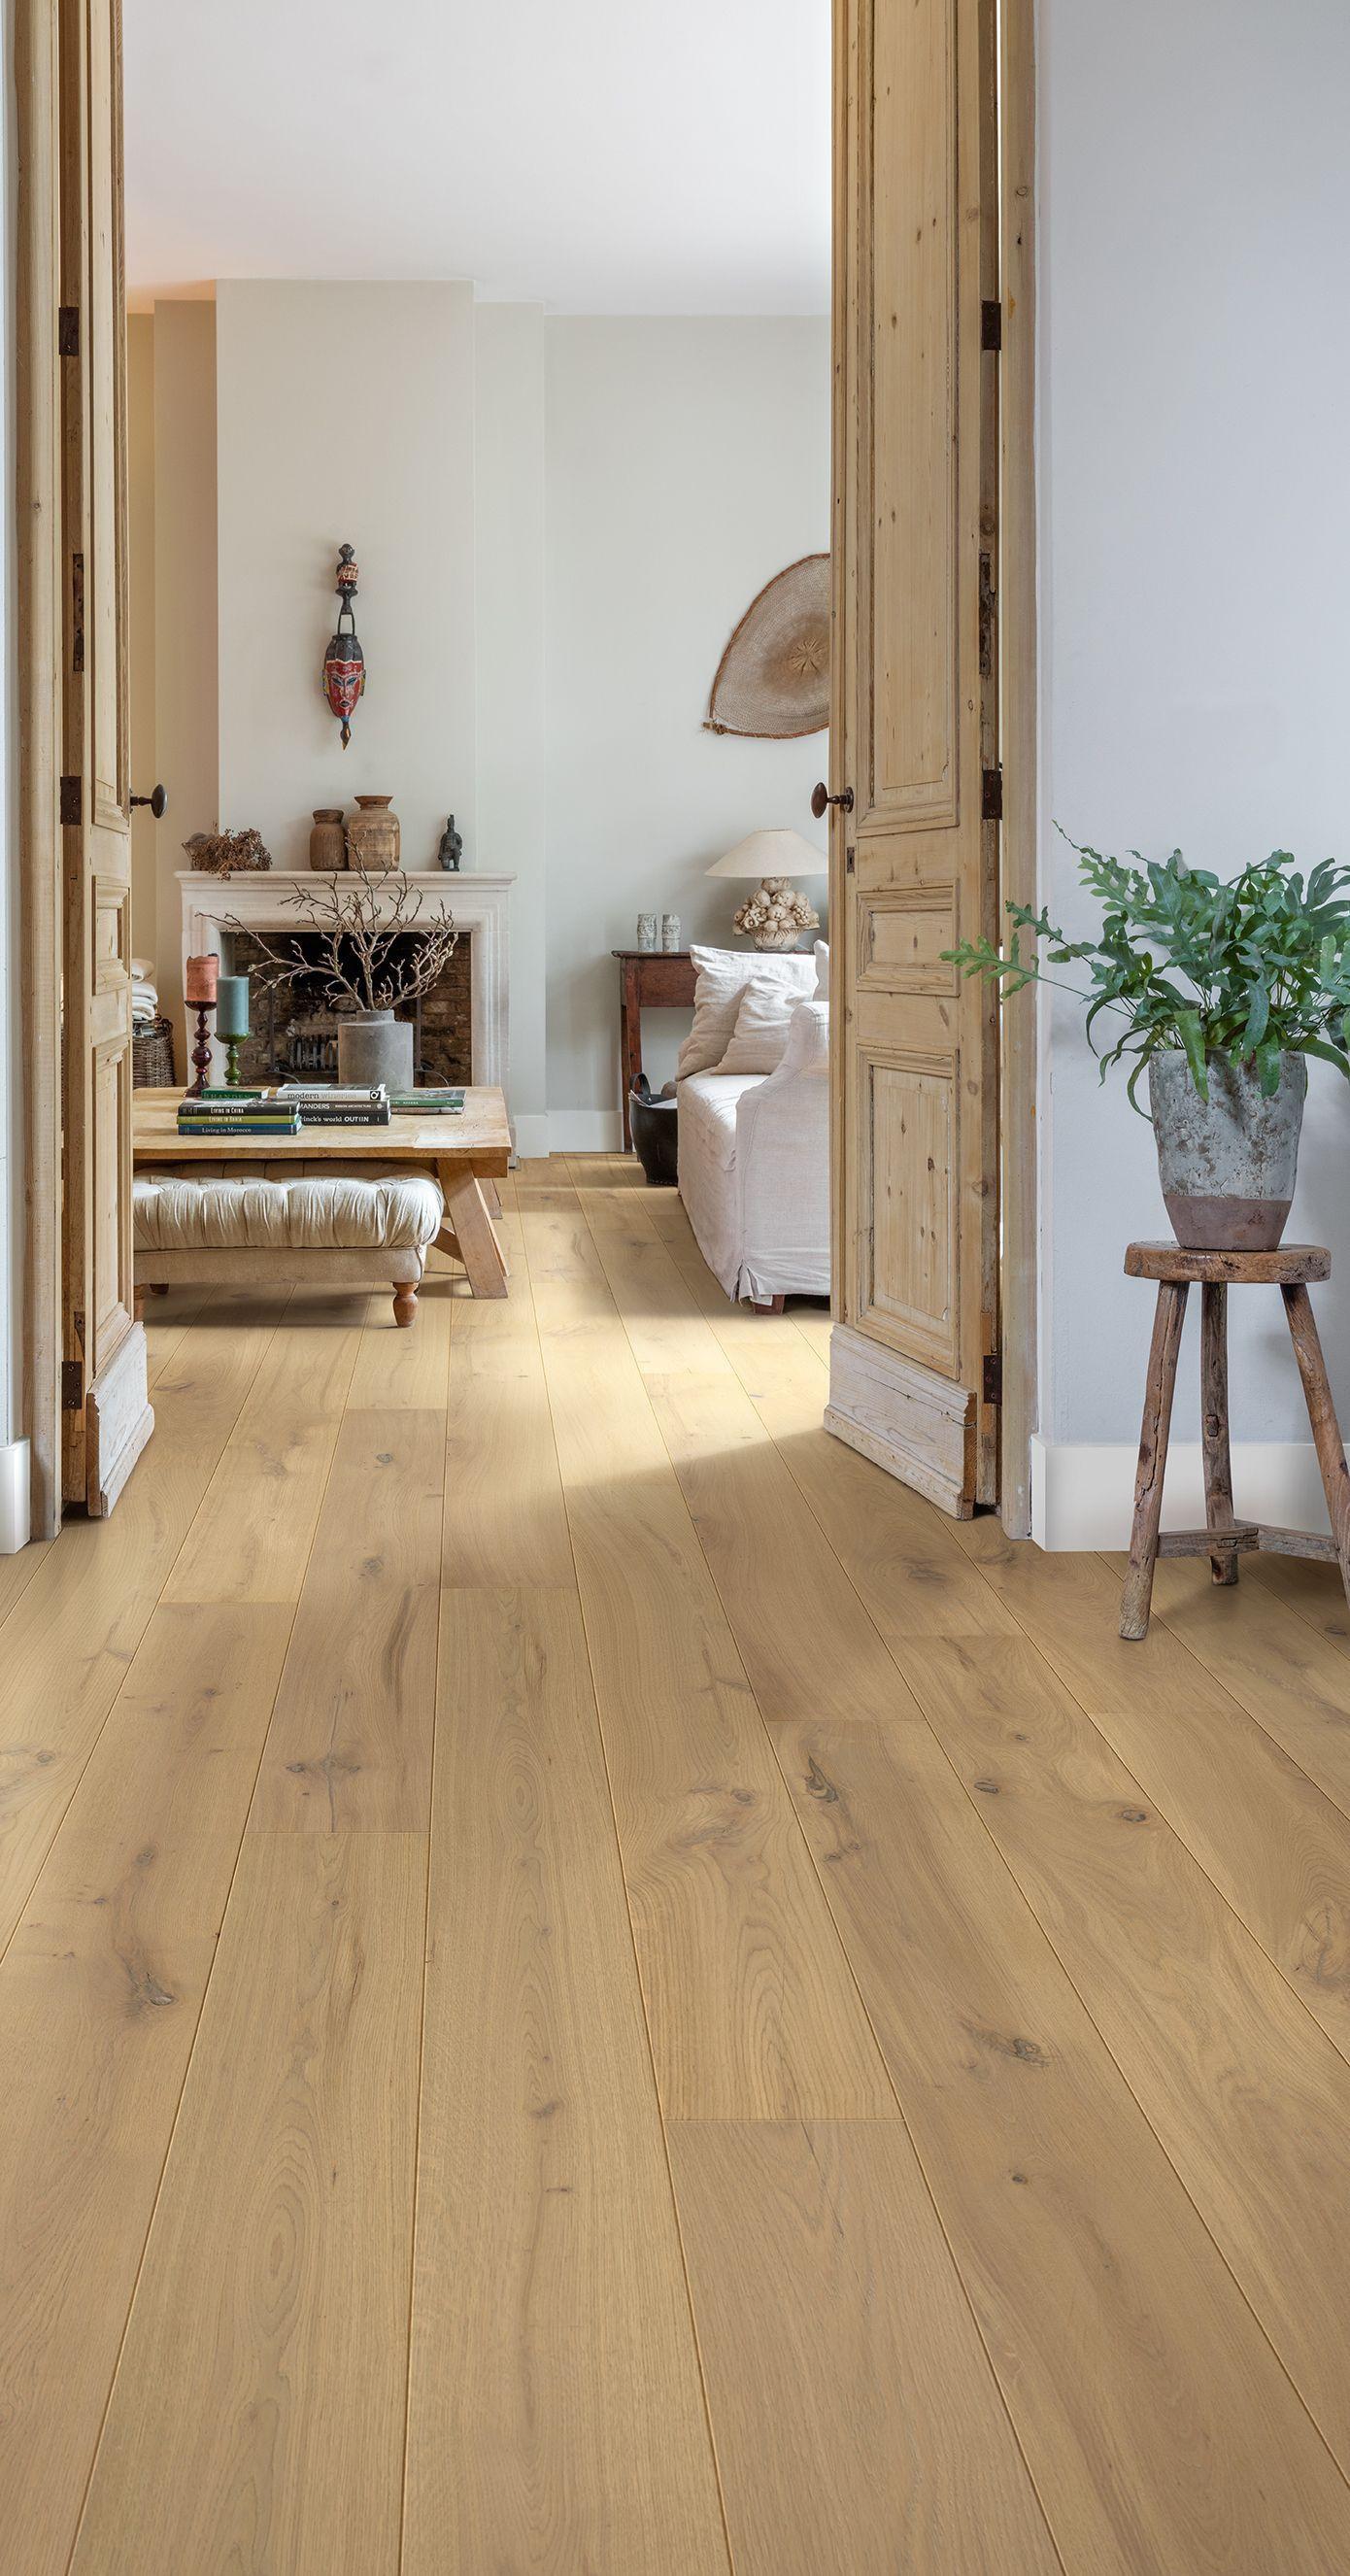 Hardwood Flooring Installation Toronto Of Laminate Or Wood Floor Plan Ideas Intended For